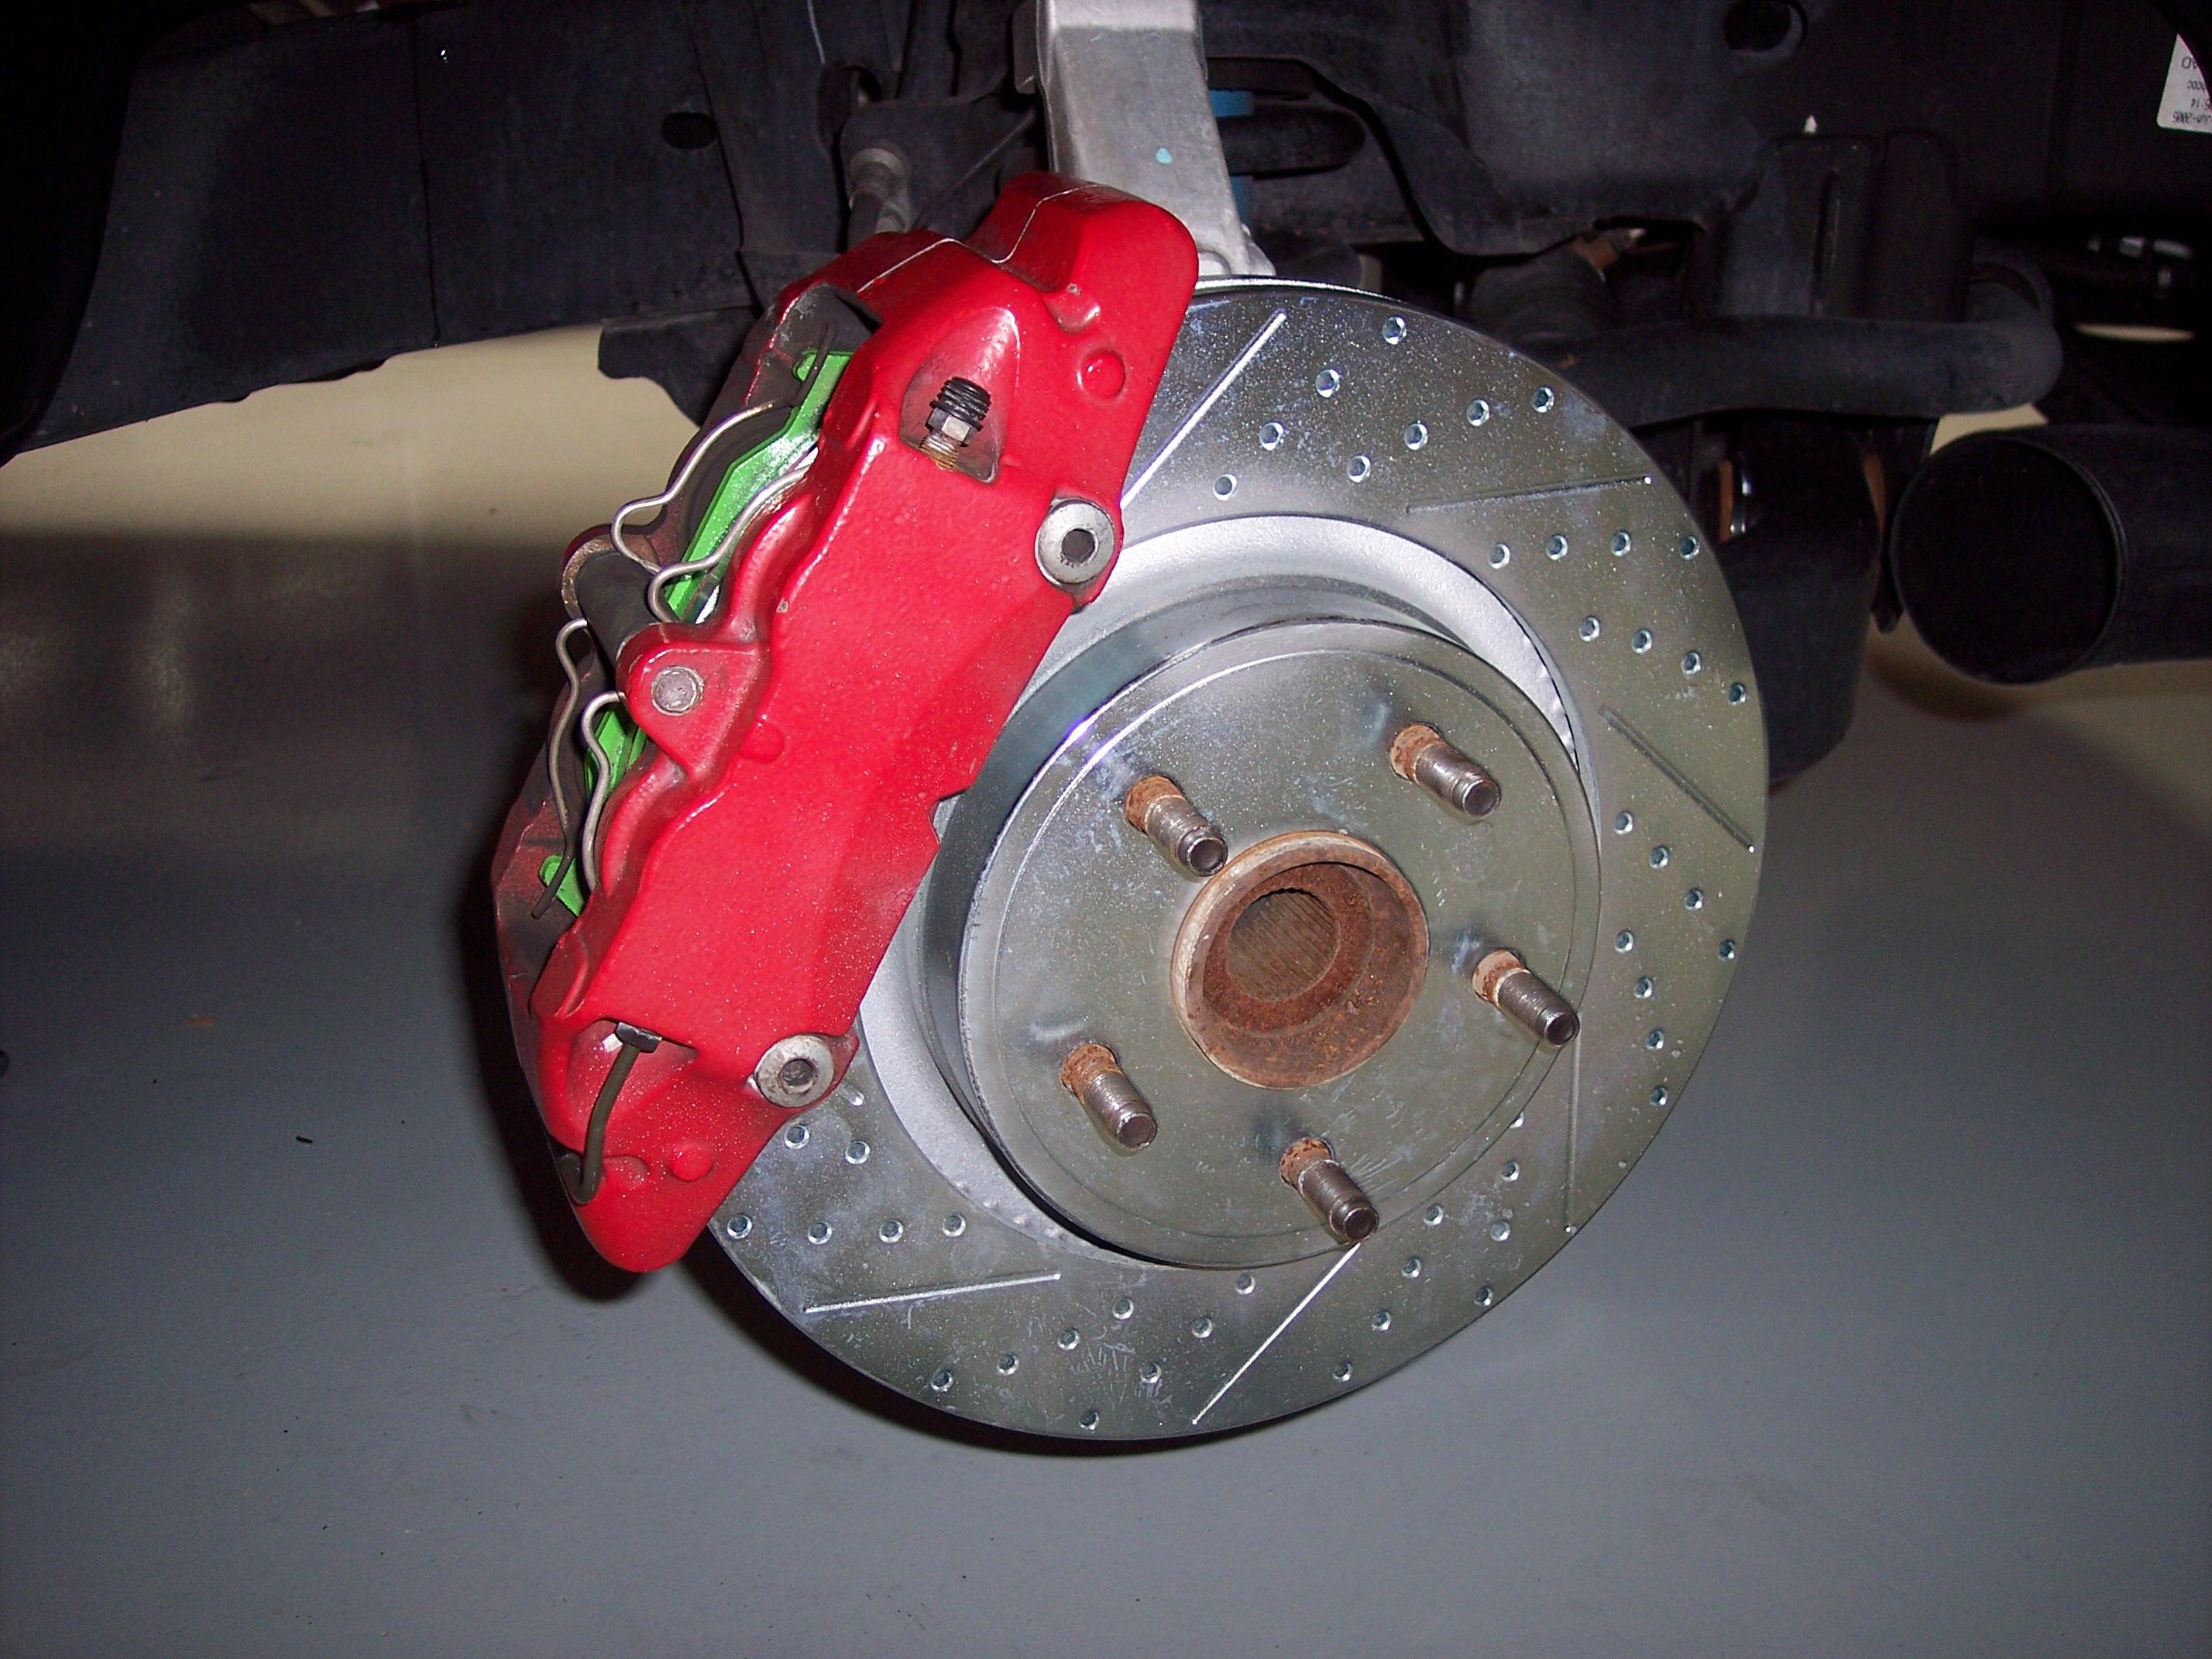 Ebc Brake Pads >> 2006 Dodge Ram 1500 SRT10 – Front Baer Rotors and EBC Pads